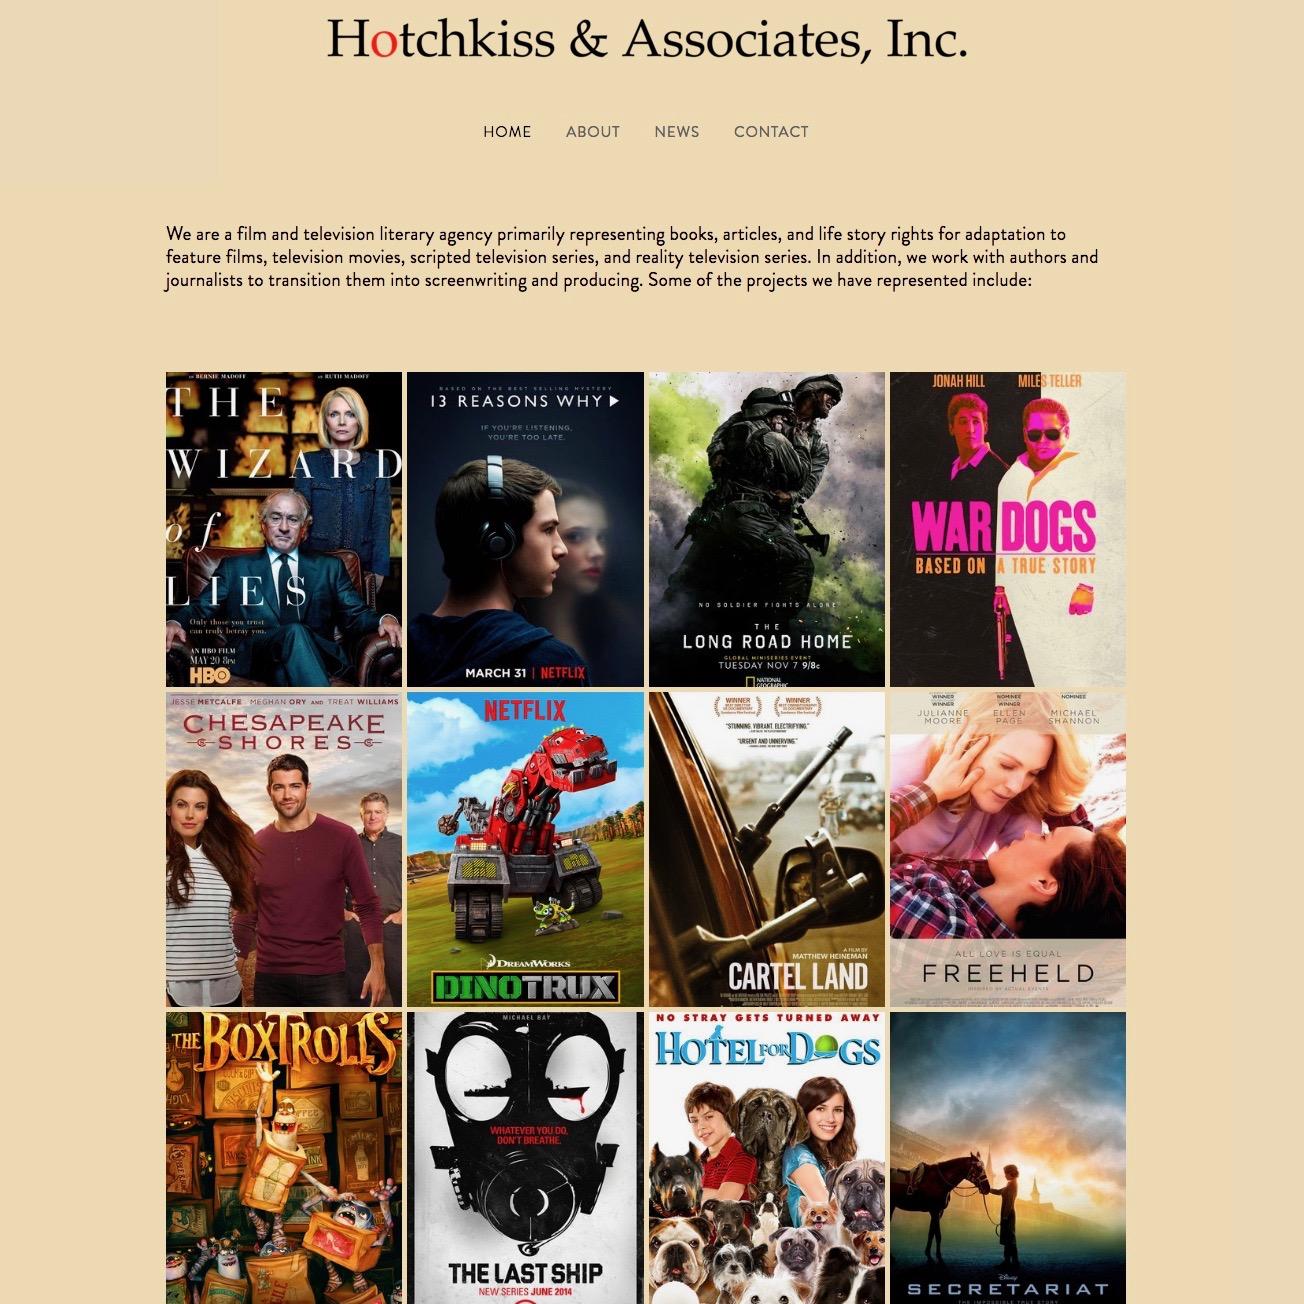 Hotchkiss & Associates, Inc.